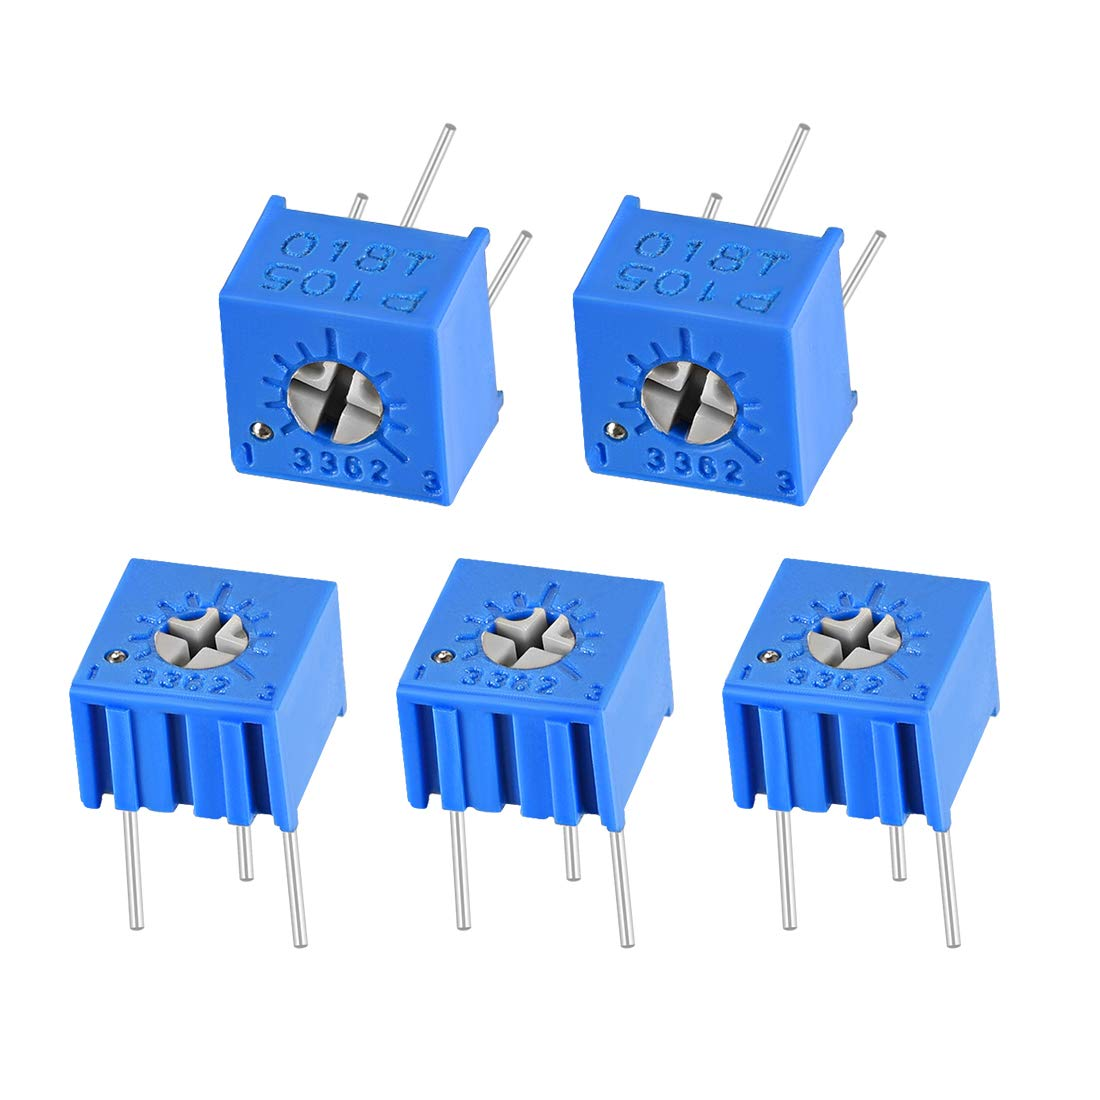 sourcing map 3362 Trimmer Potentiometer 1K Ohm Top Adjustment Horizontal Variable Resistors 5Pcs